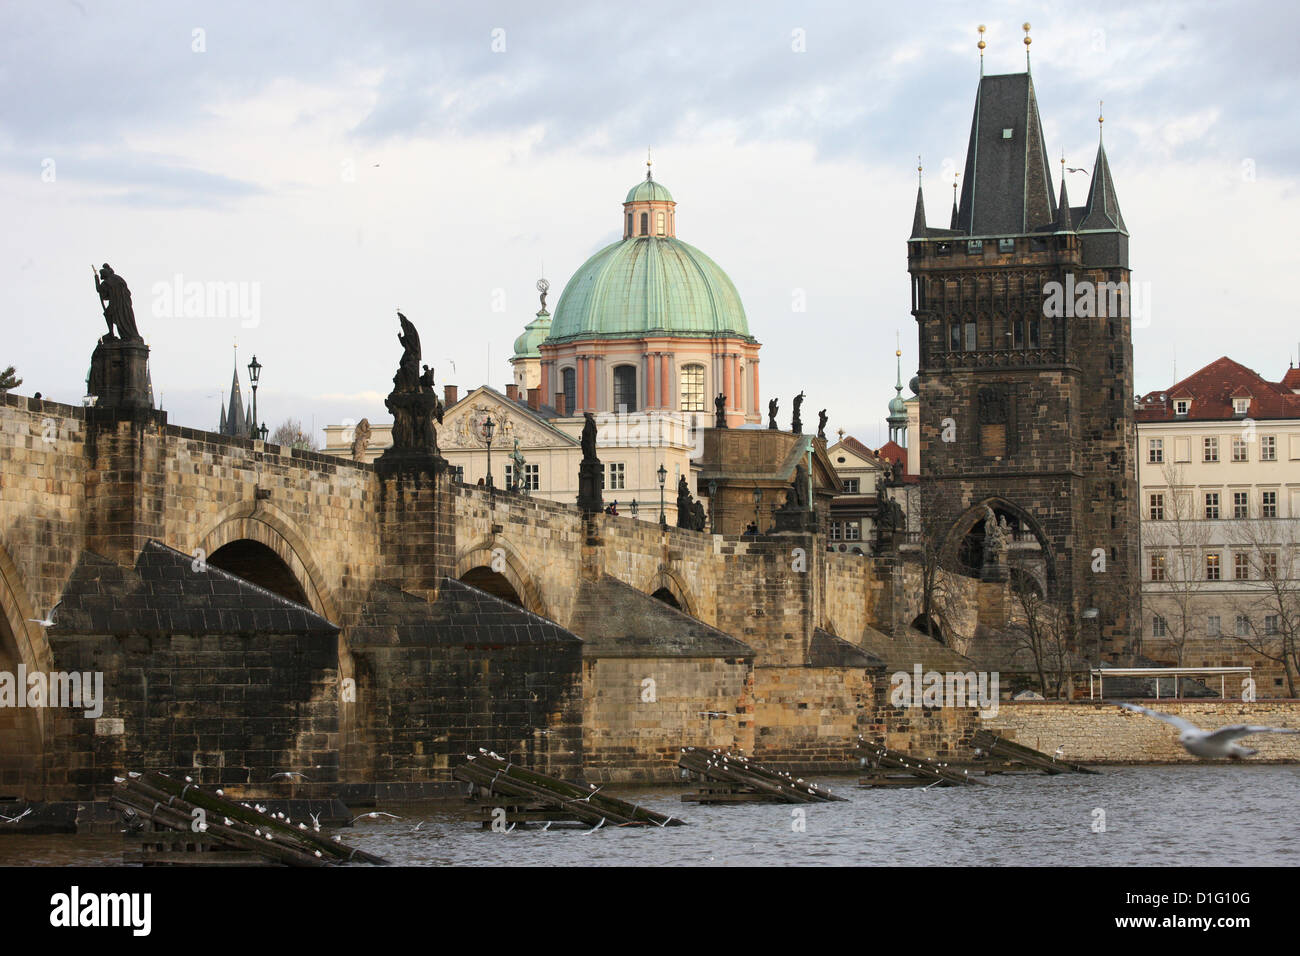 Charles bridge, UNESCO World Heritage Site, and River Vltava, Prague, Czech Republic, Europe - Stock Image